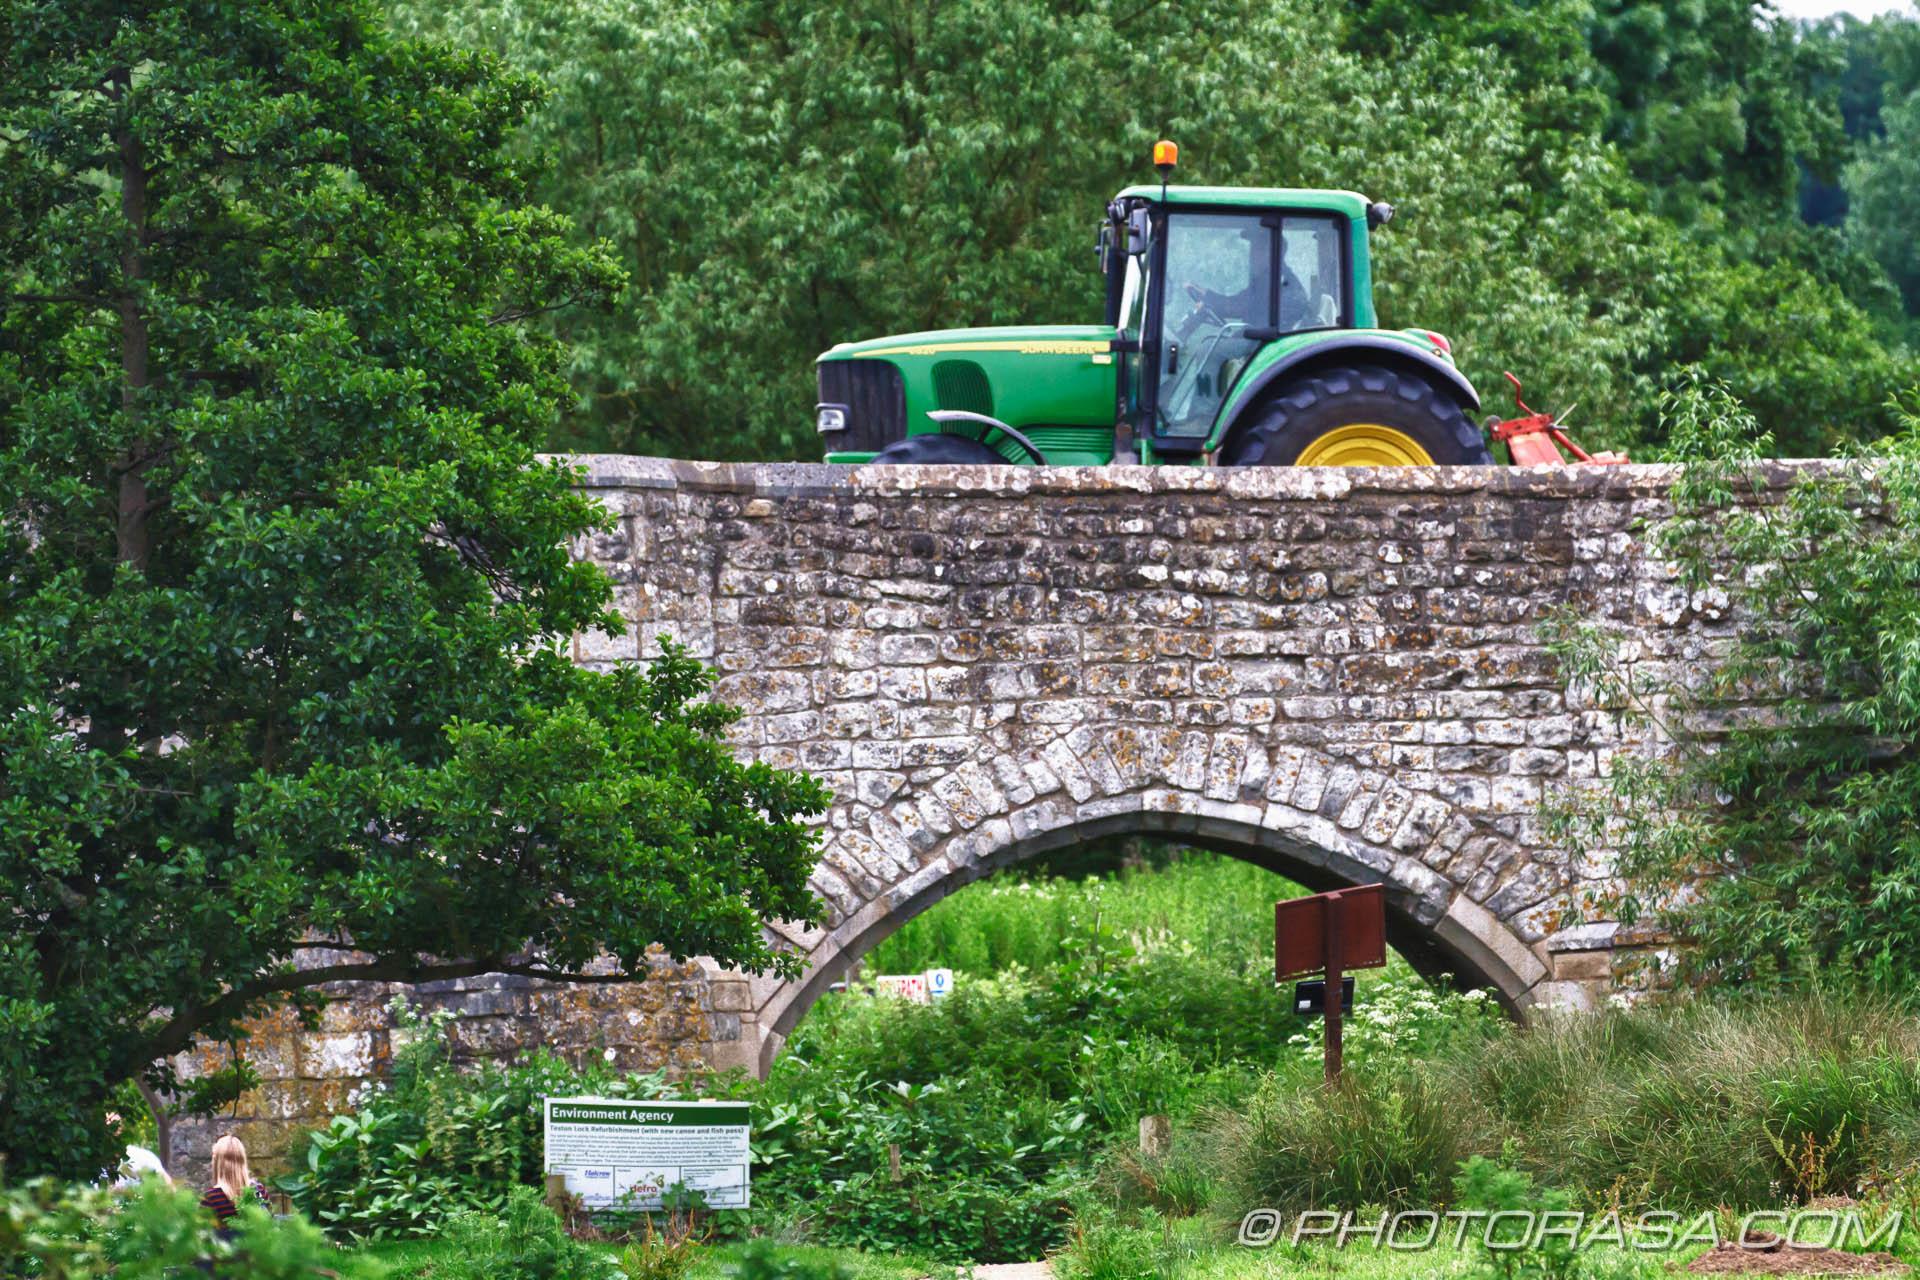 https://photorasa.com/farming/tractor-going-over-teston-bridge/